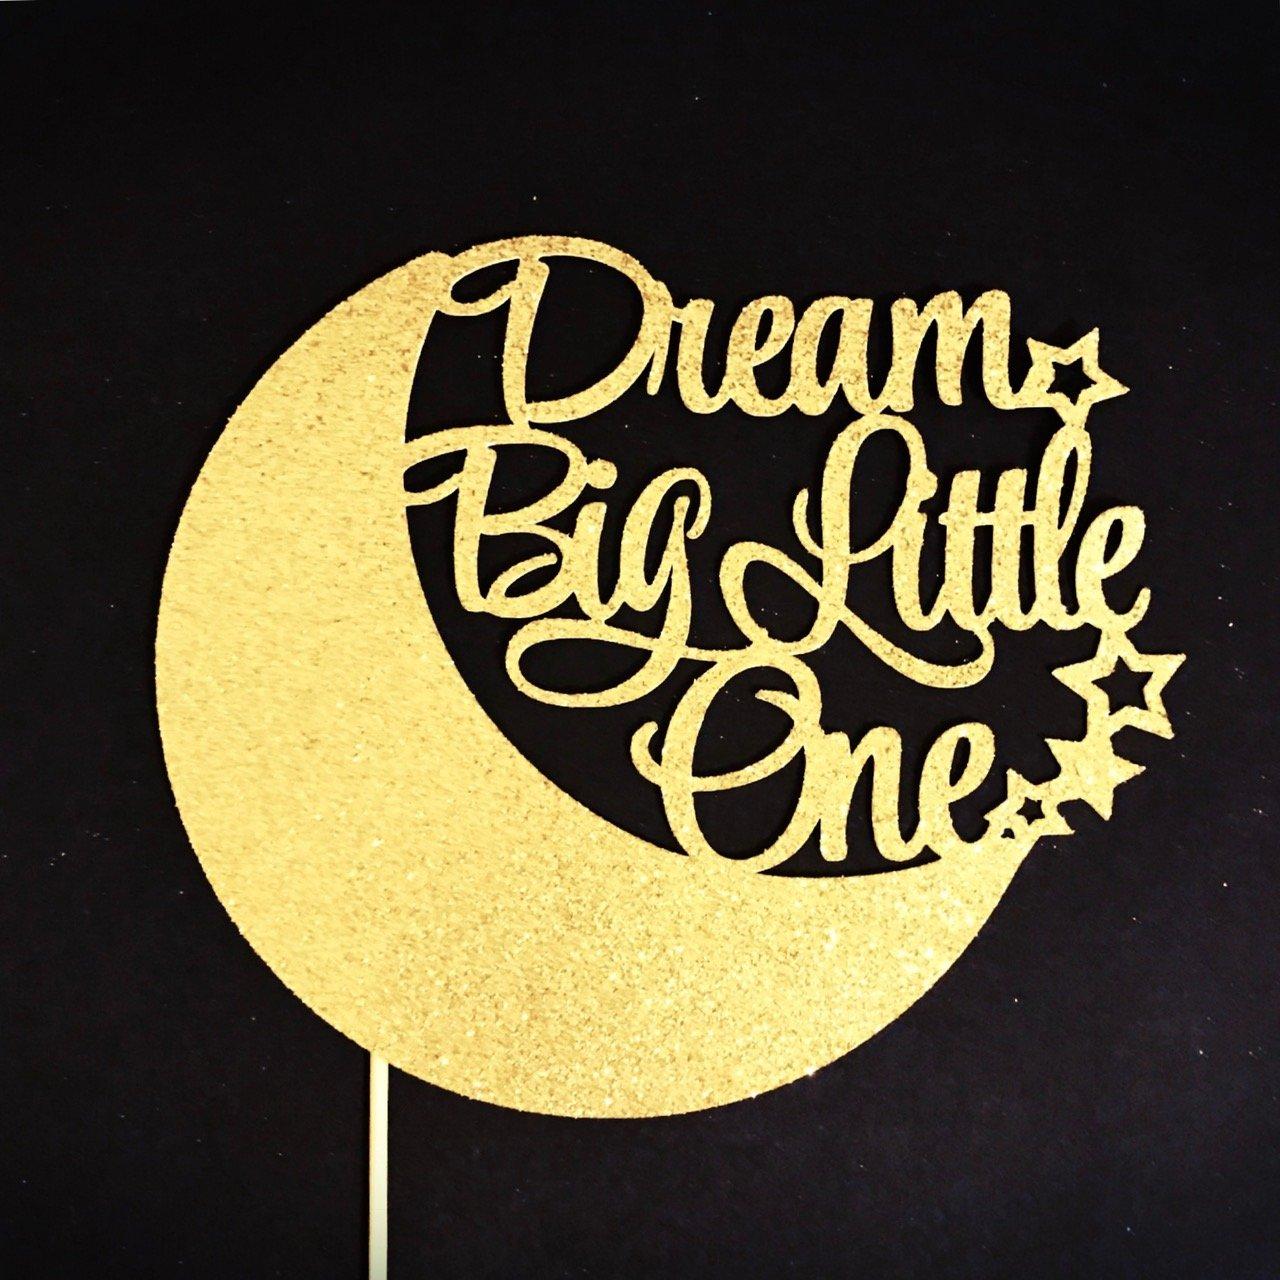 Dream Big Little One Cake Topper, Twinkle Twinkle Little Star Cake Topper, Baby Shower Topper, Baby Birthday Topper, Star Cake Topper, Moon Cake Topper